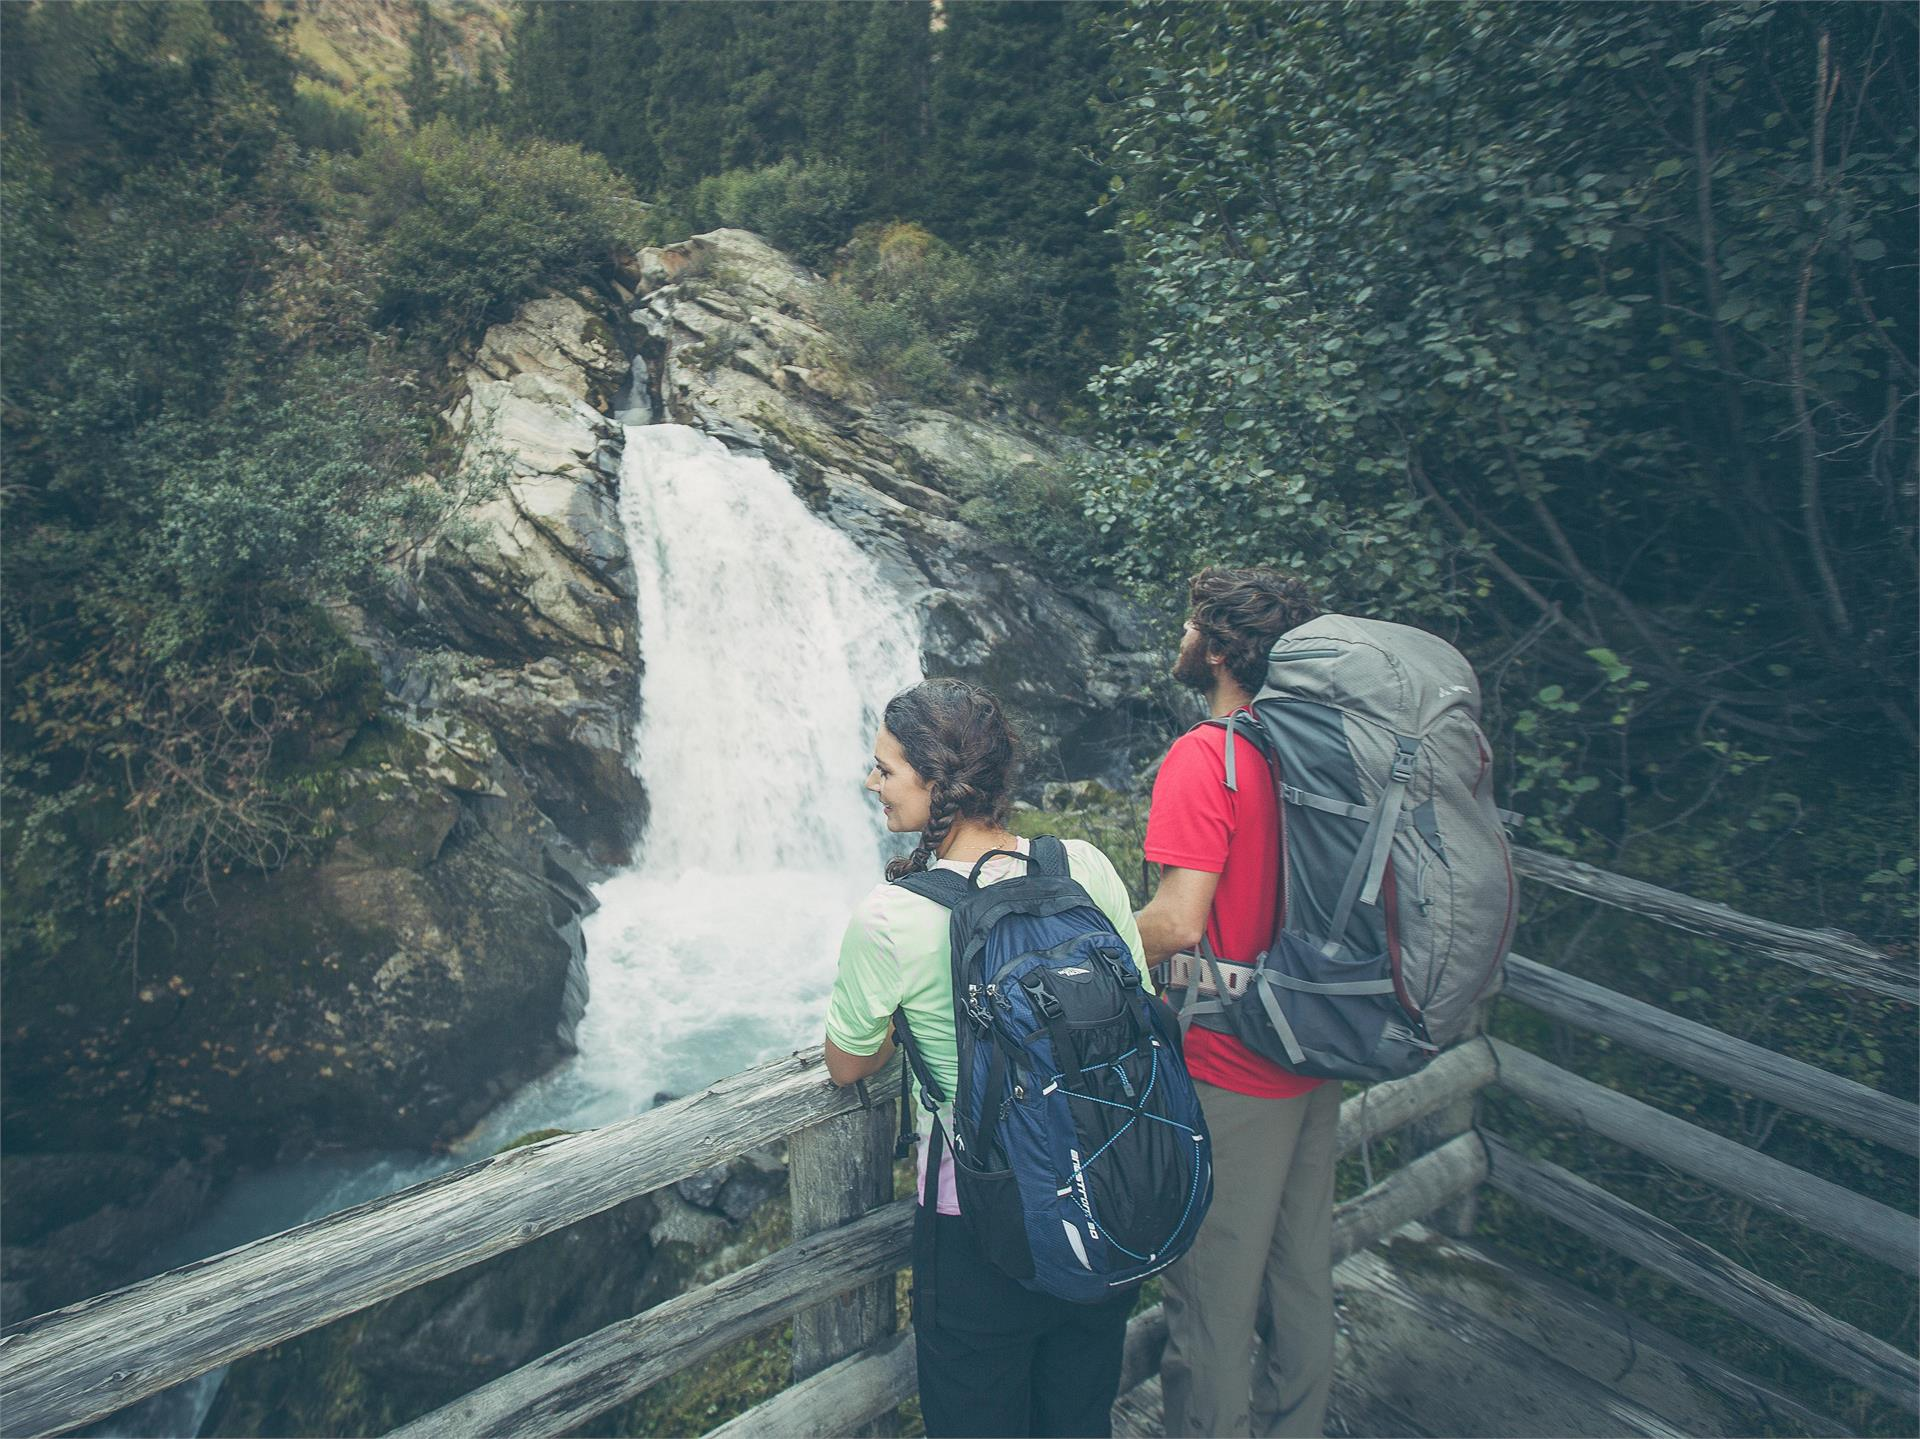 Burkhard Gorge